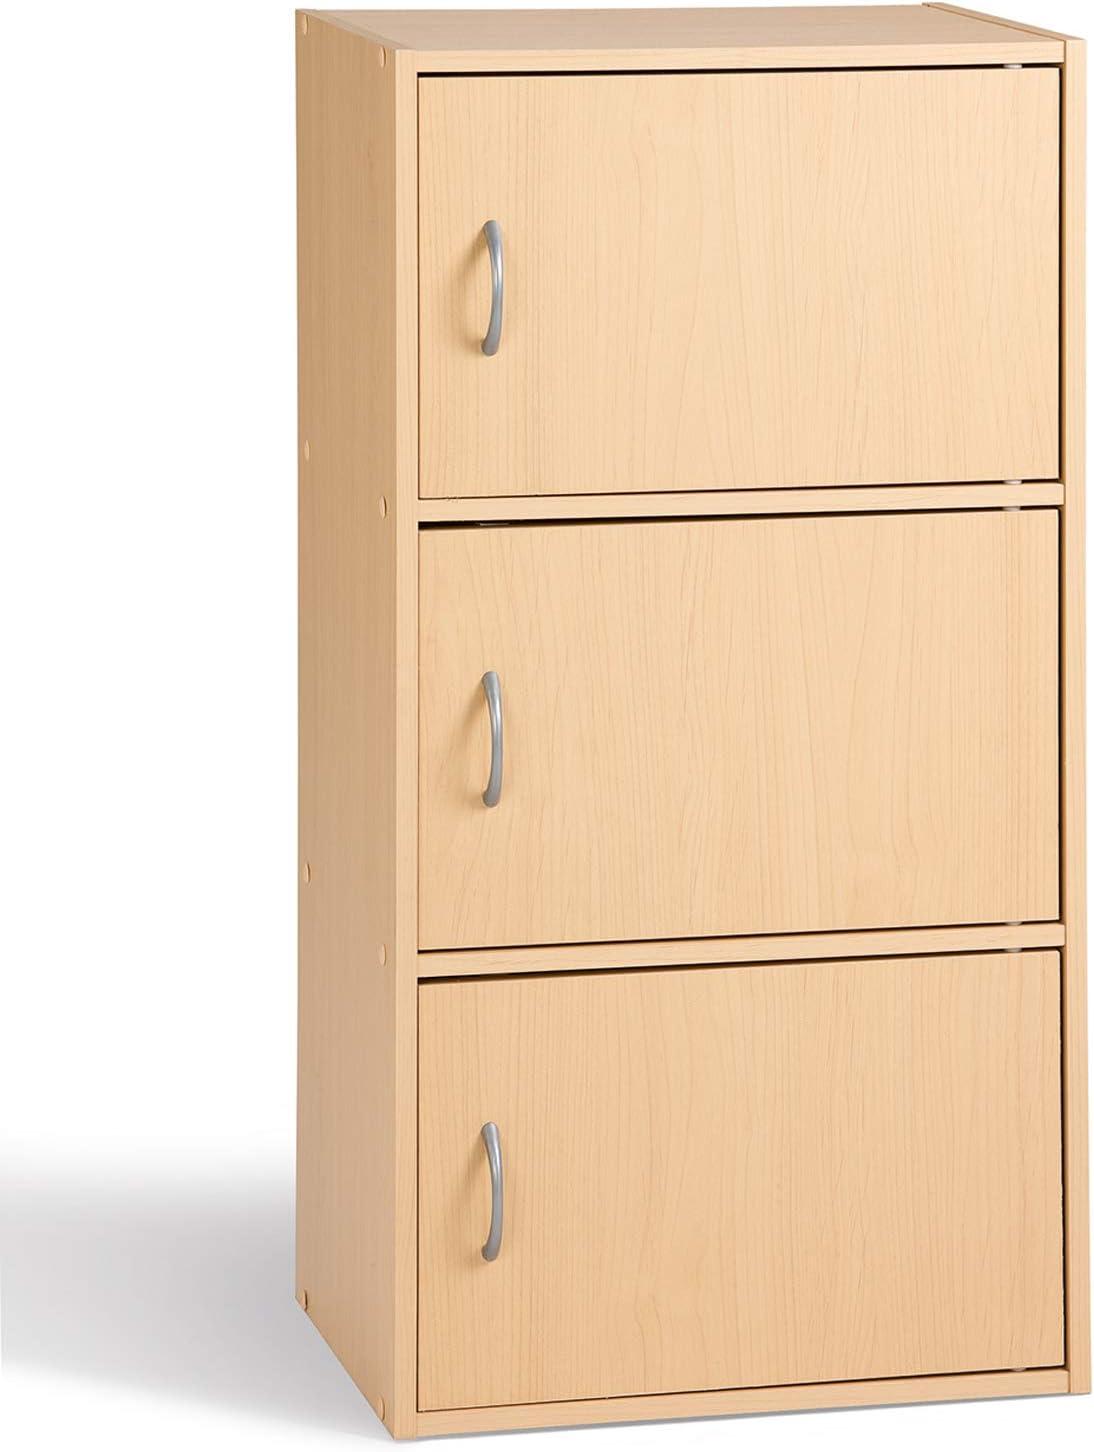 Alsapan Cube 1311 91440 Bookcase 3 Doors 40 x 29 x 80 cm Beech